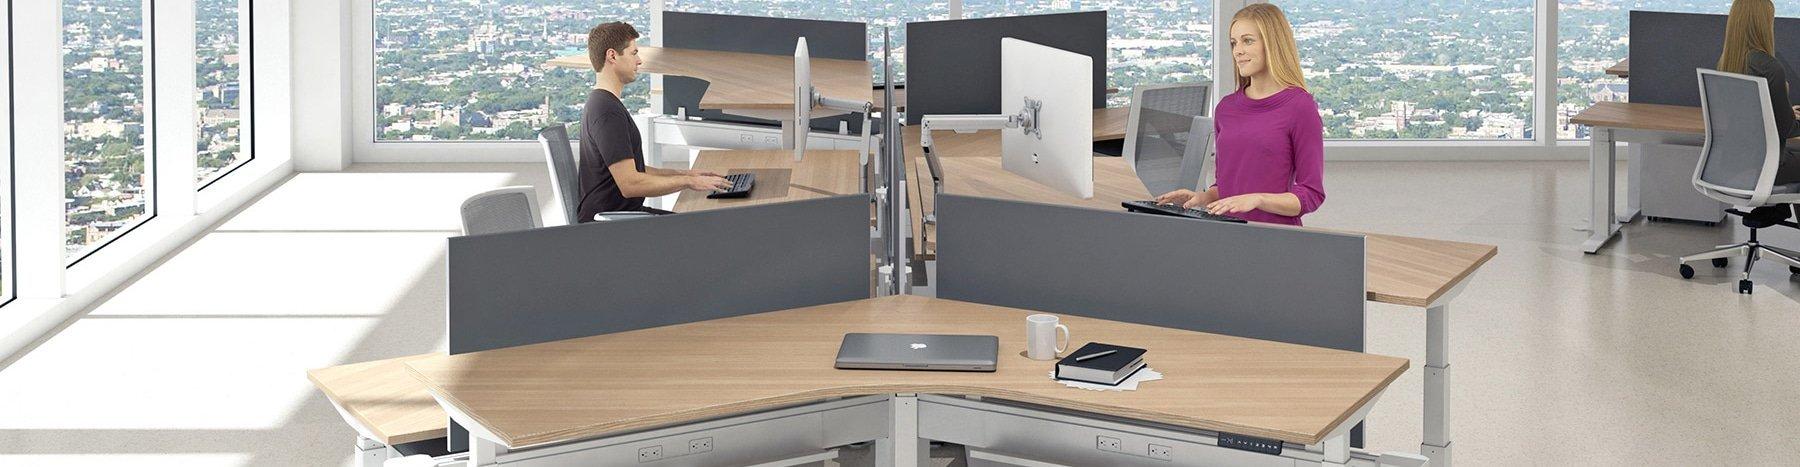 Standup desks in a bright modern office